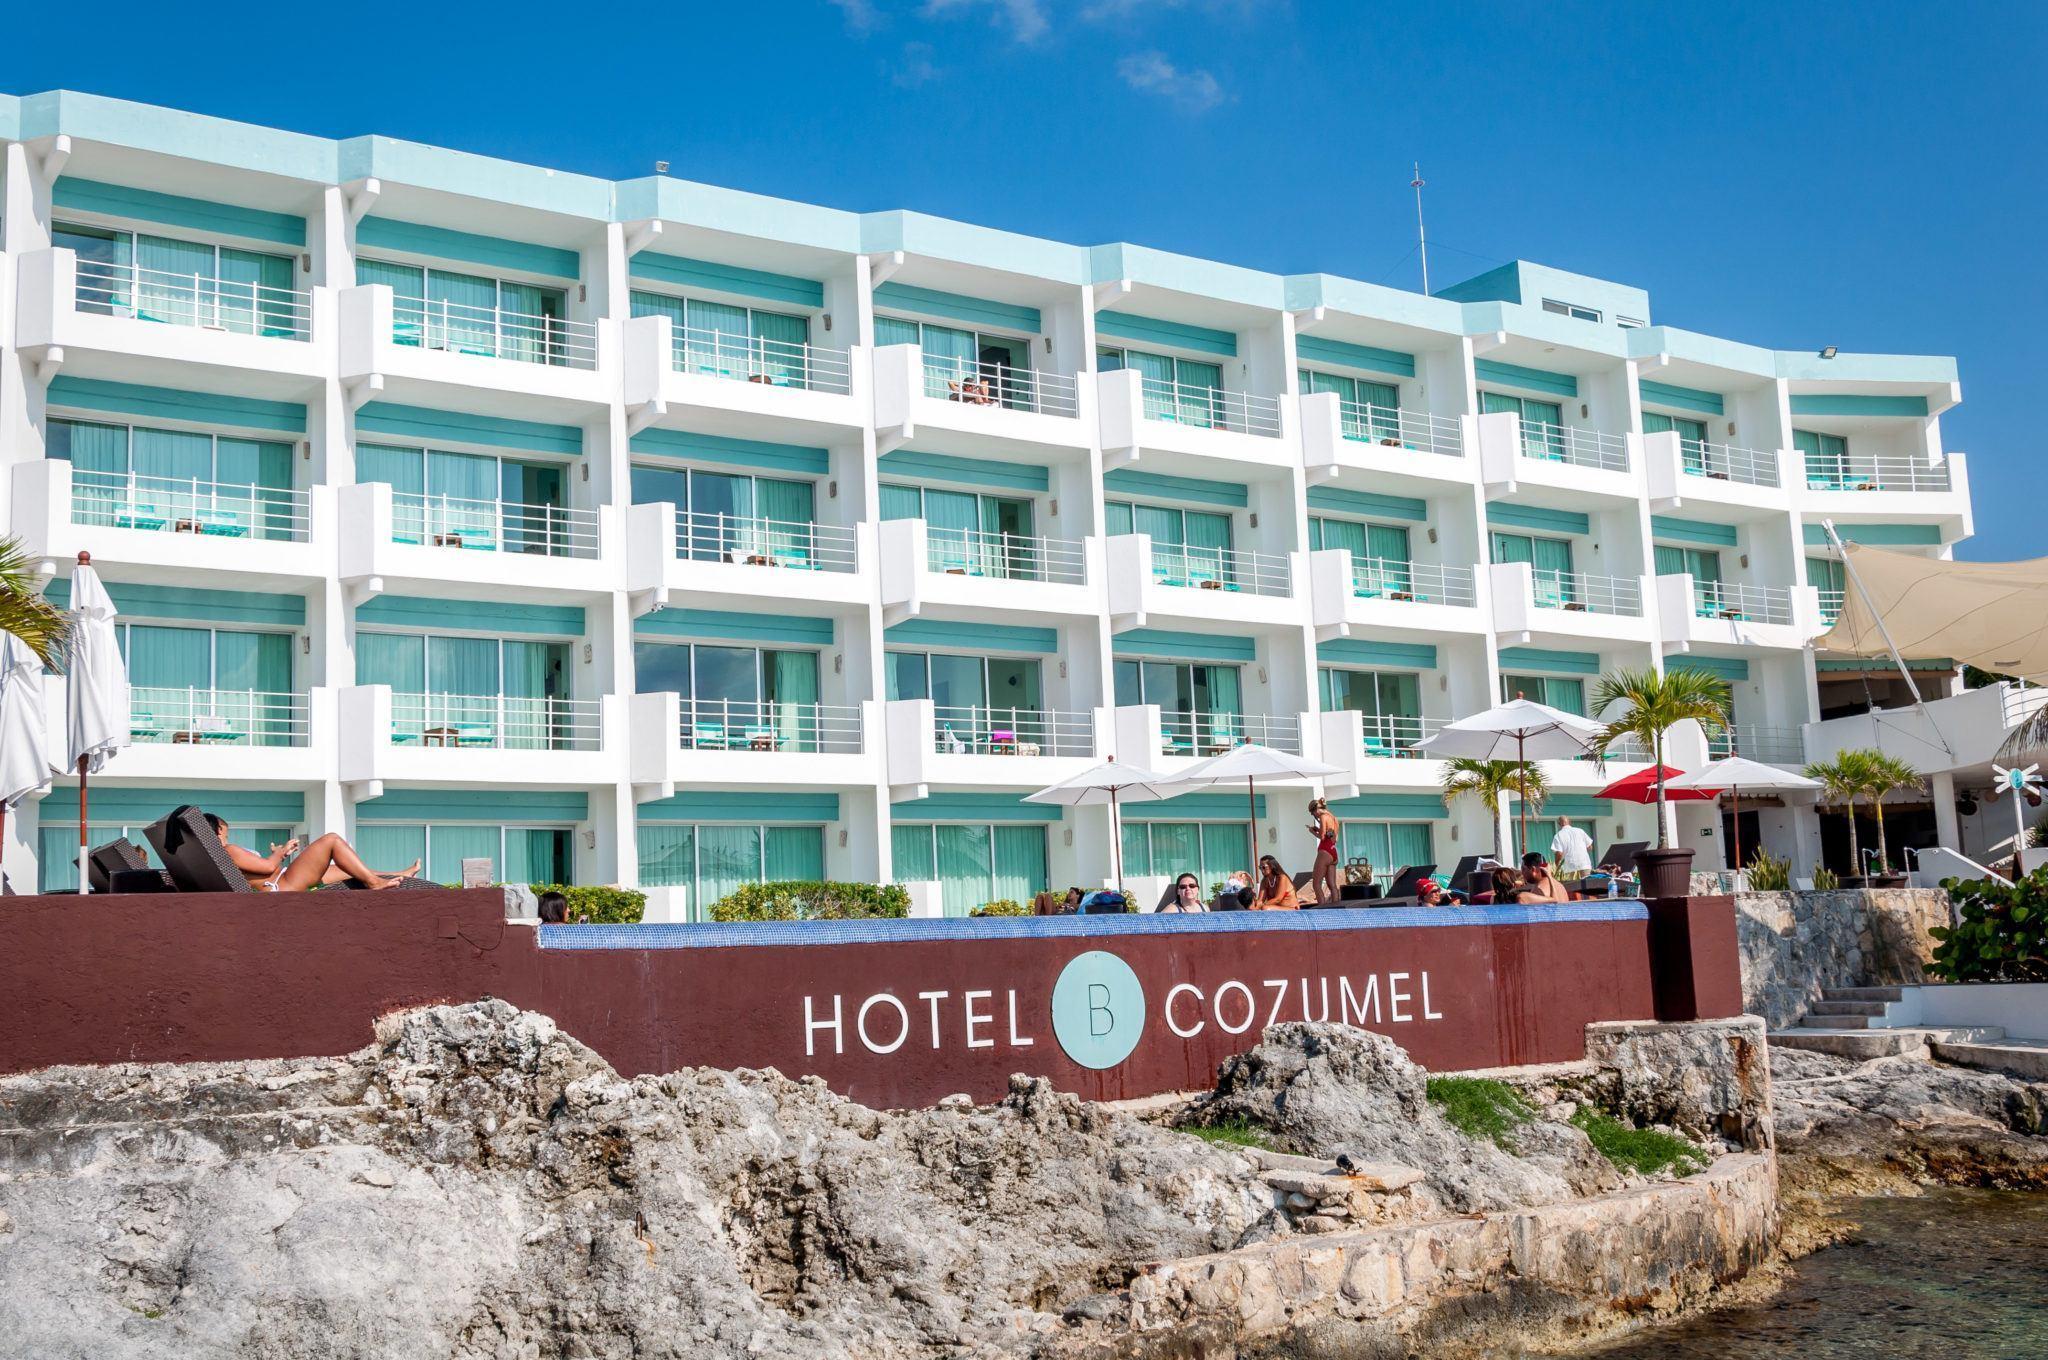 The beachfront Hotel B Cozumel